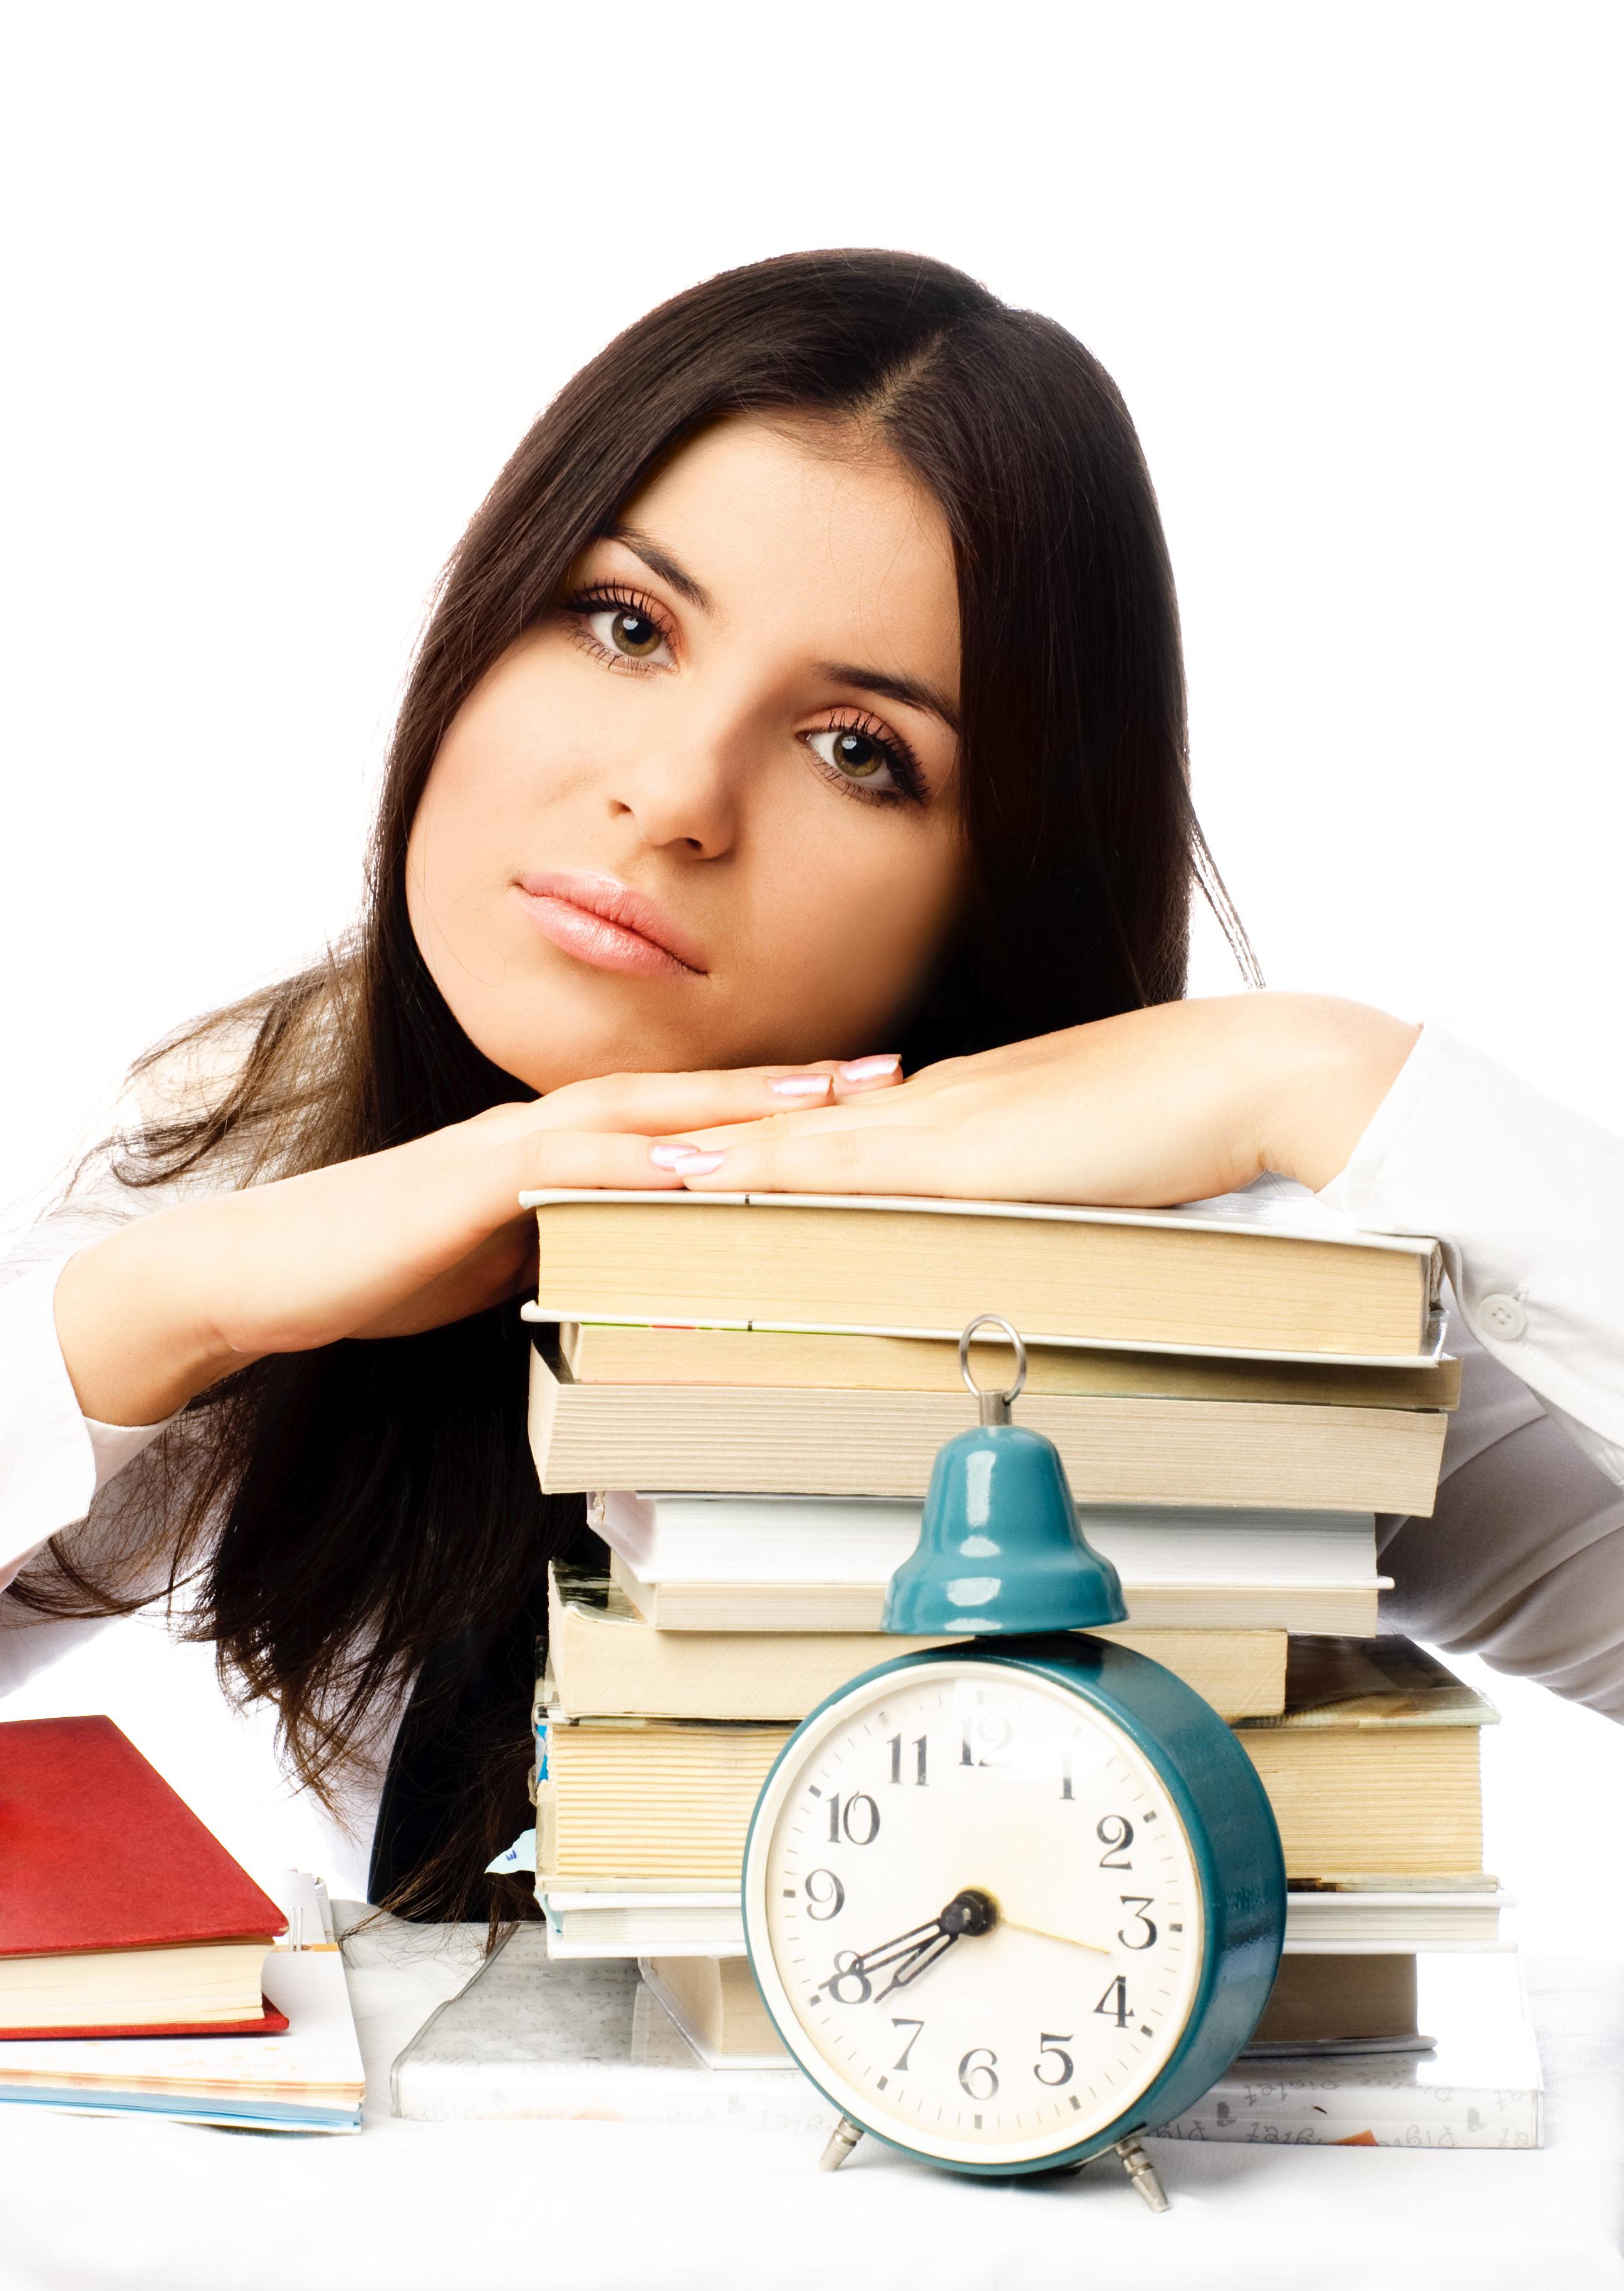 Duke study homework helps students succeed